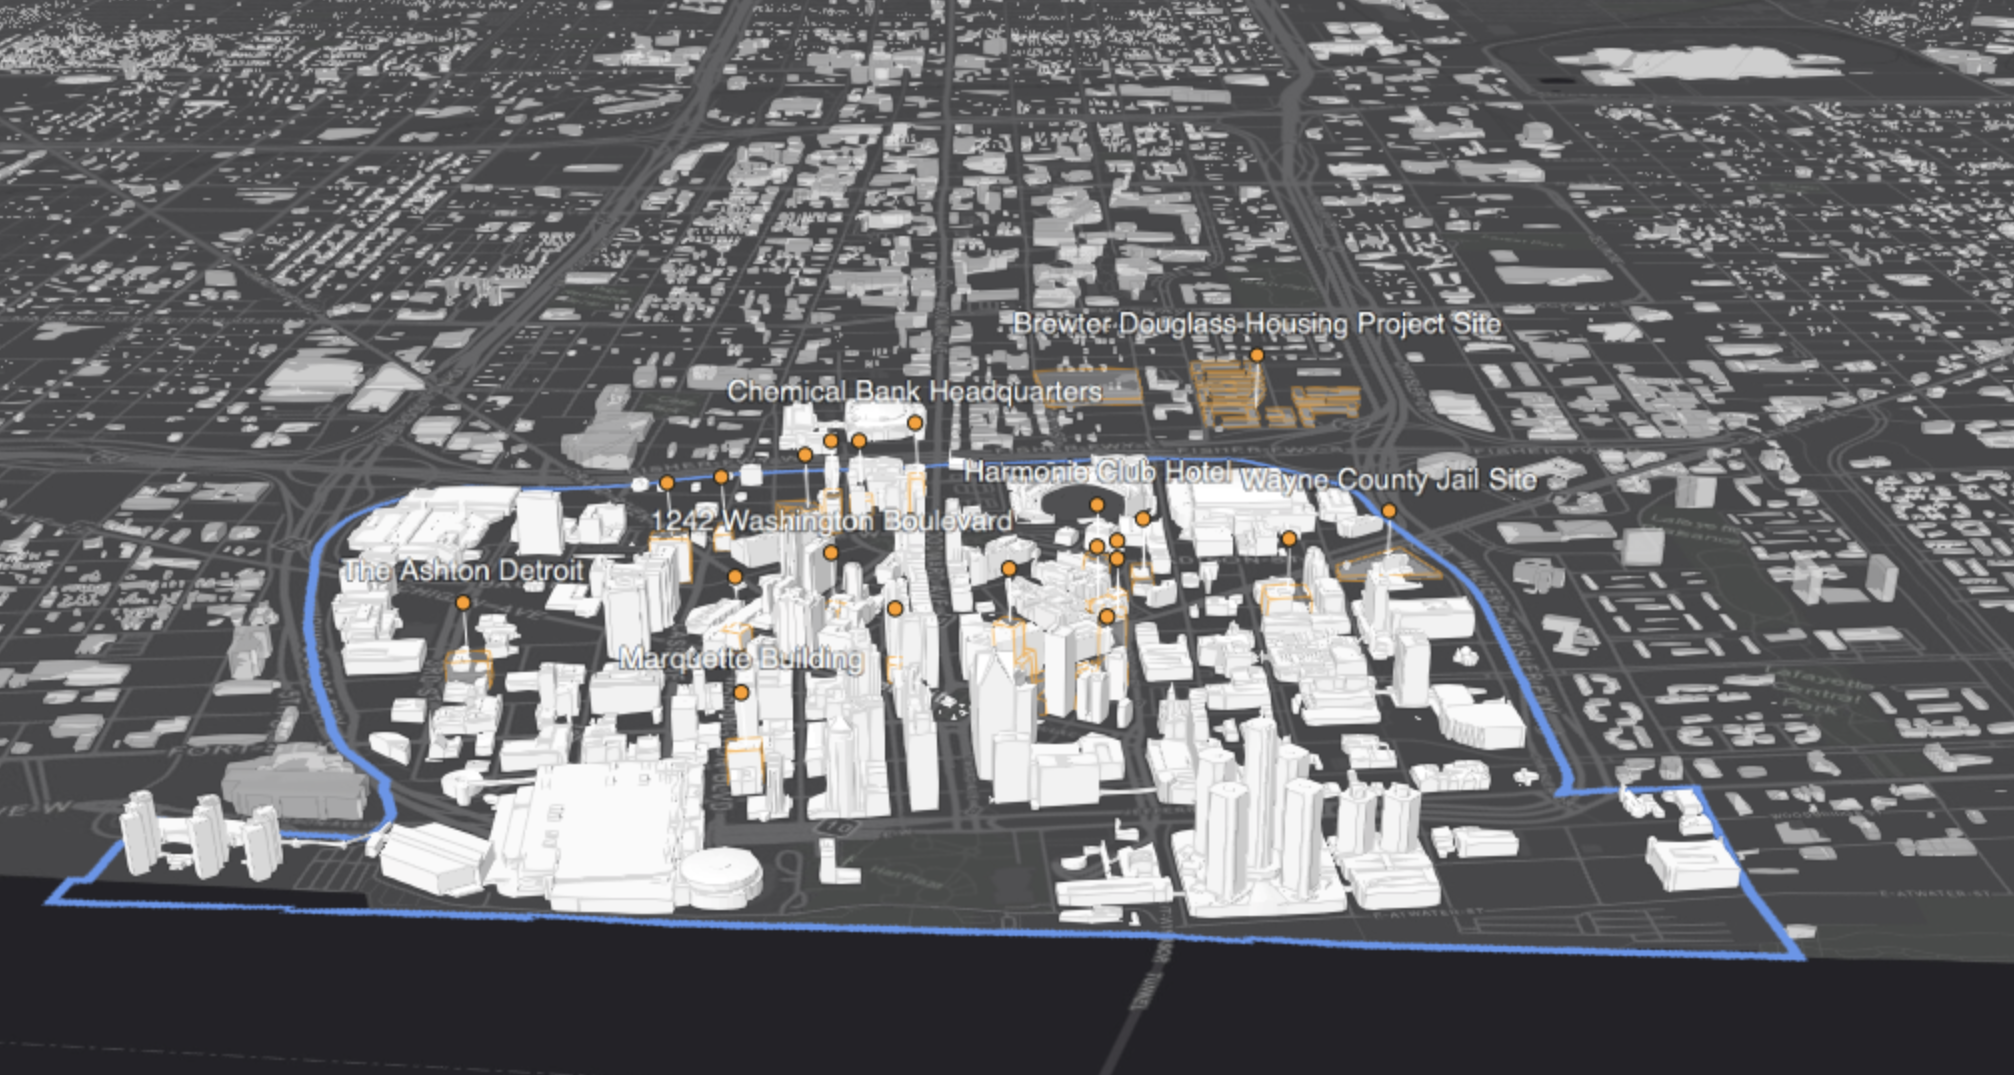 New interactive map reveals downtown Detroit development progress and pipeline